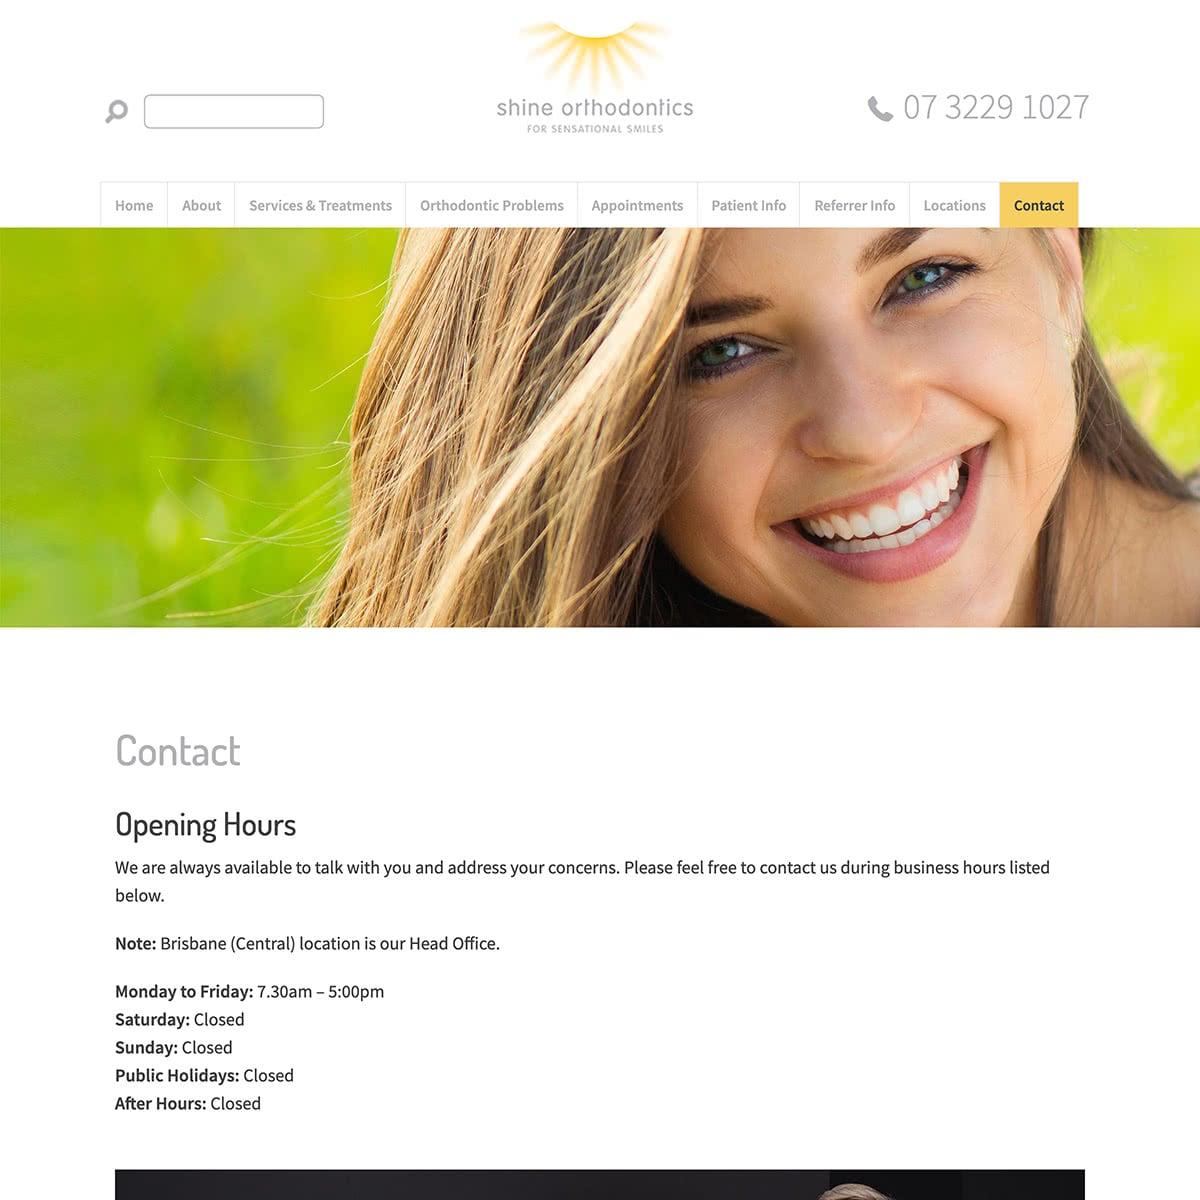 Shine Orthodontics - Contact